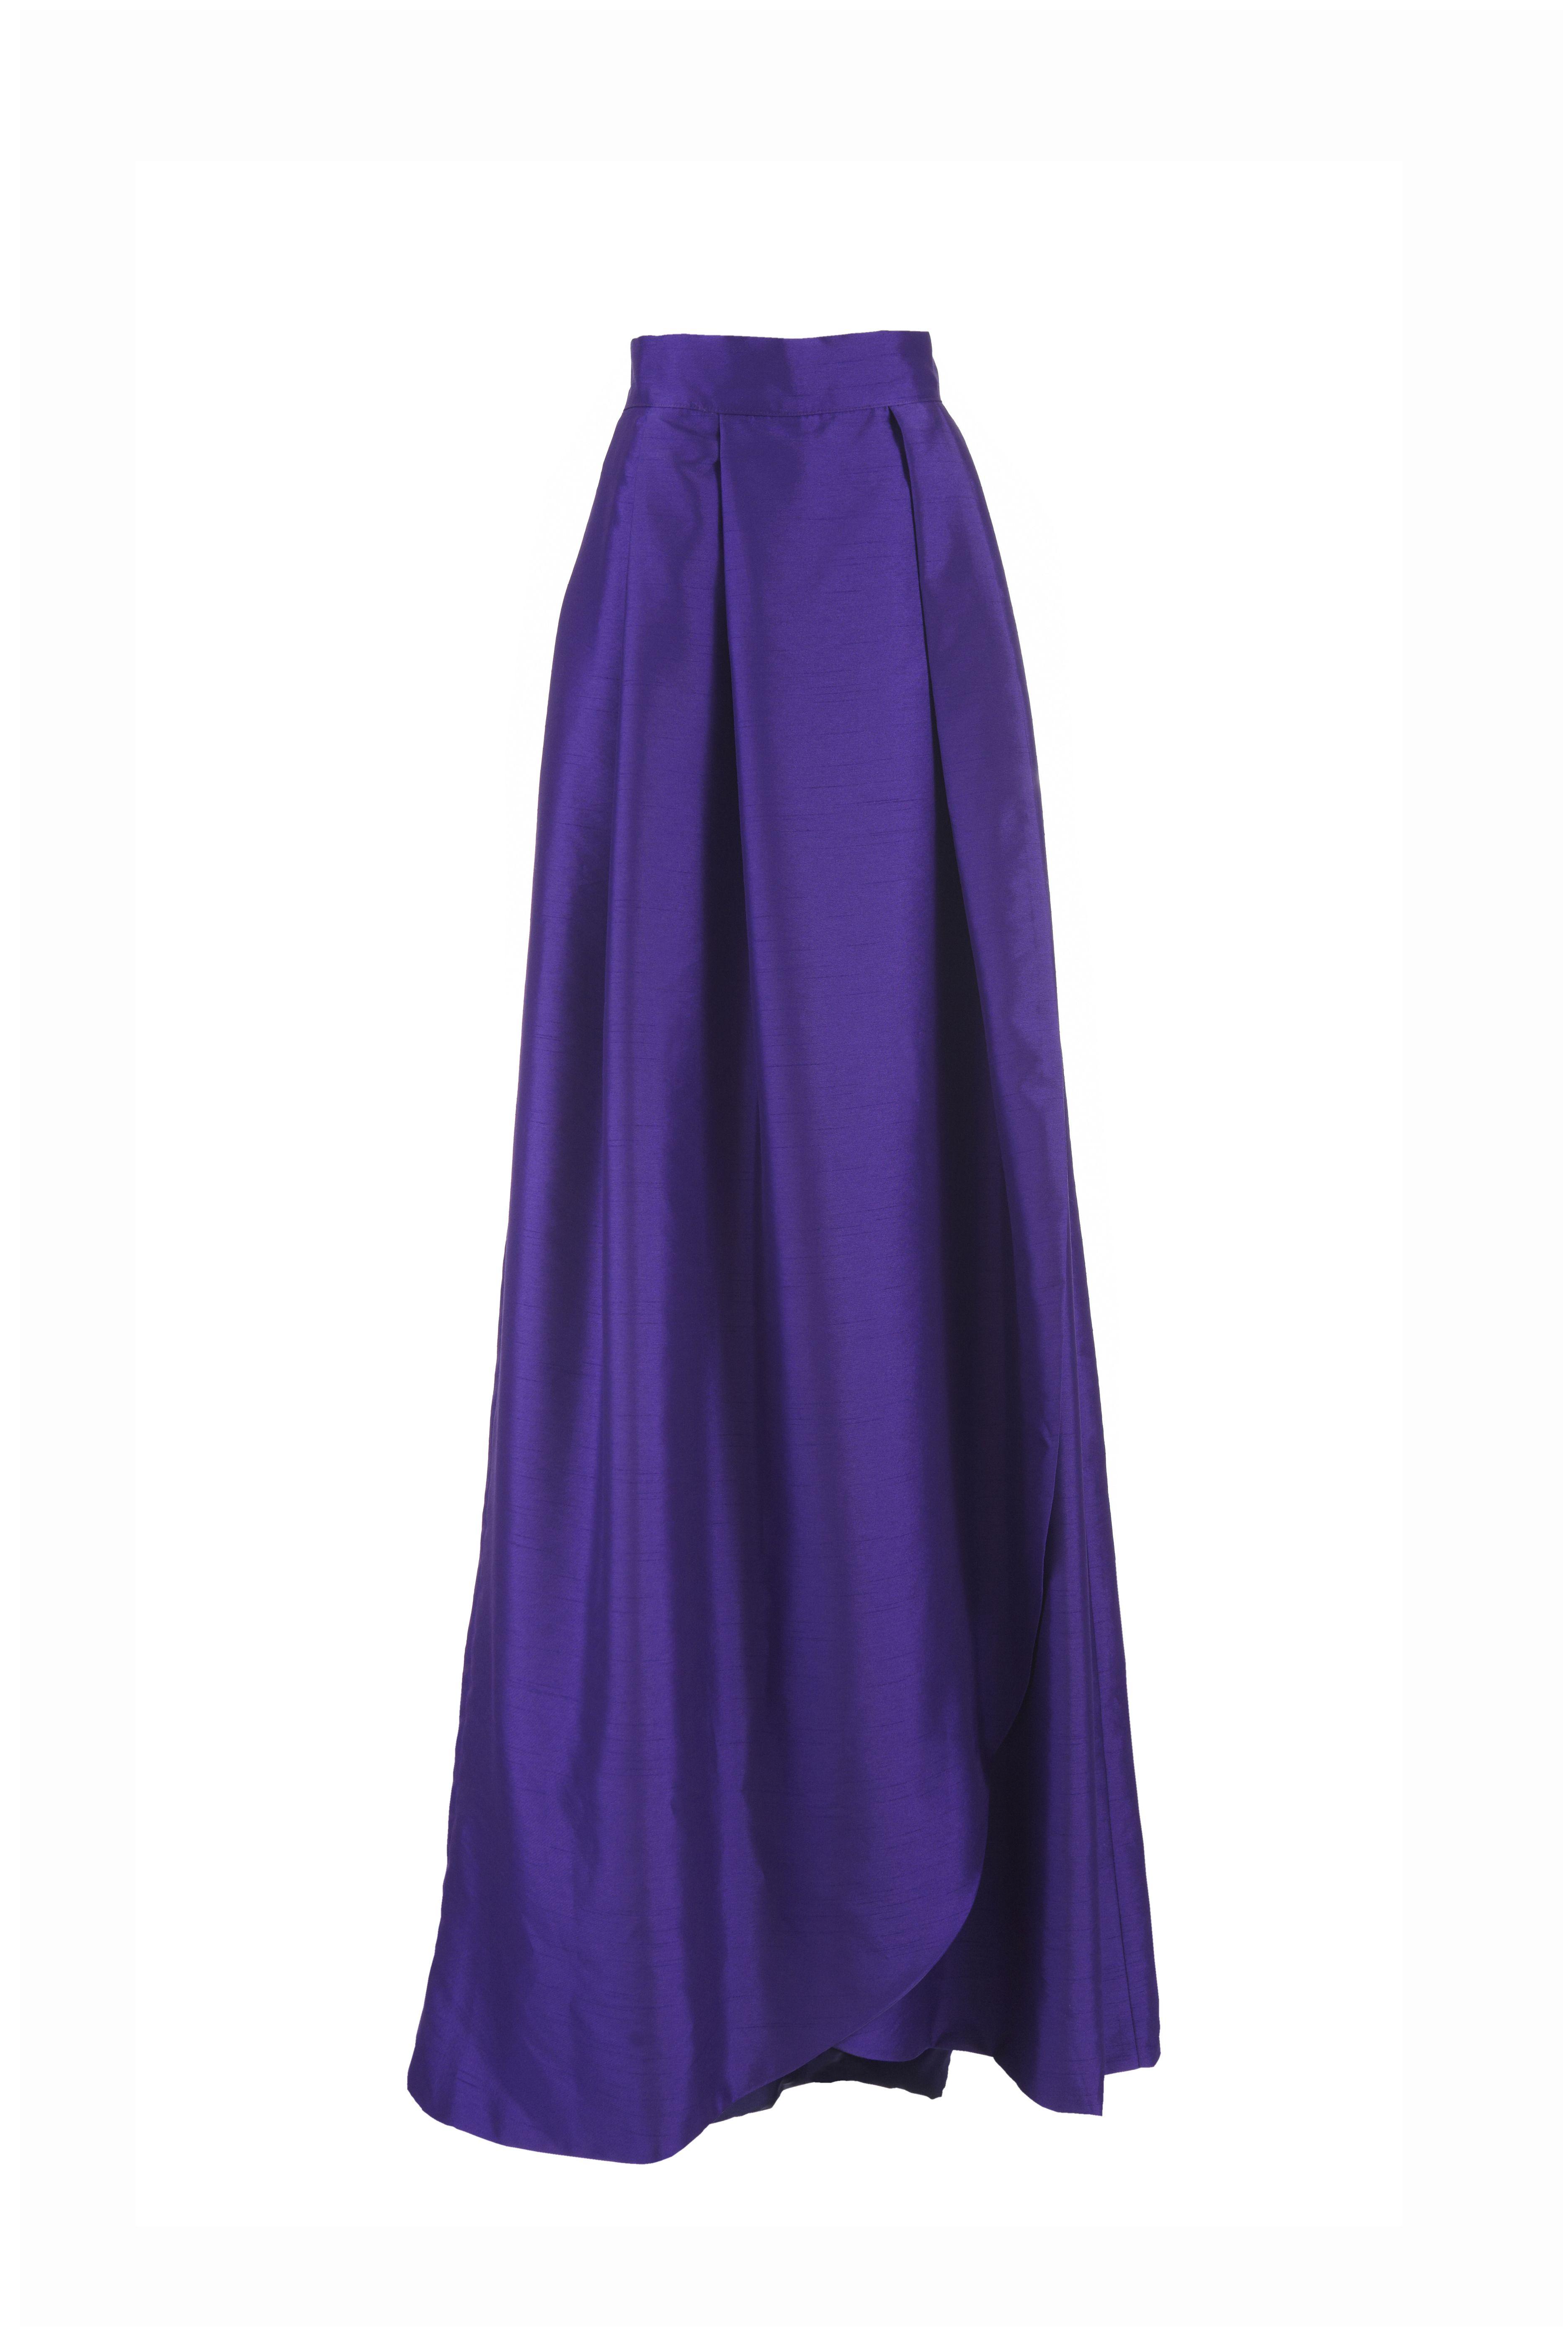 Falda larga Victoria morada Miticca by Isabella Gobarodi  39a7887fceef